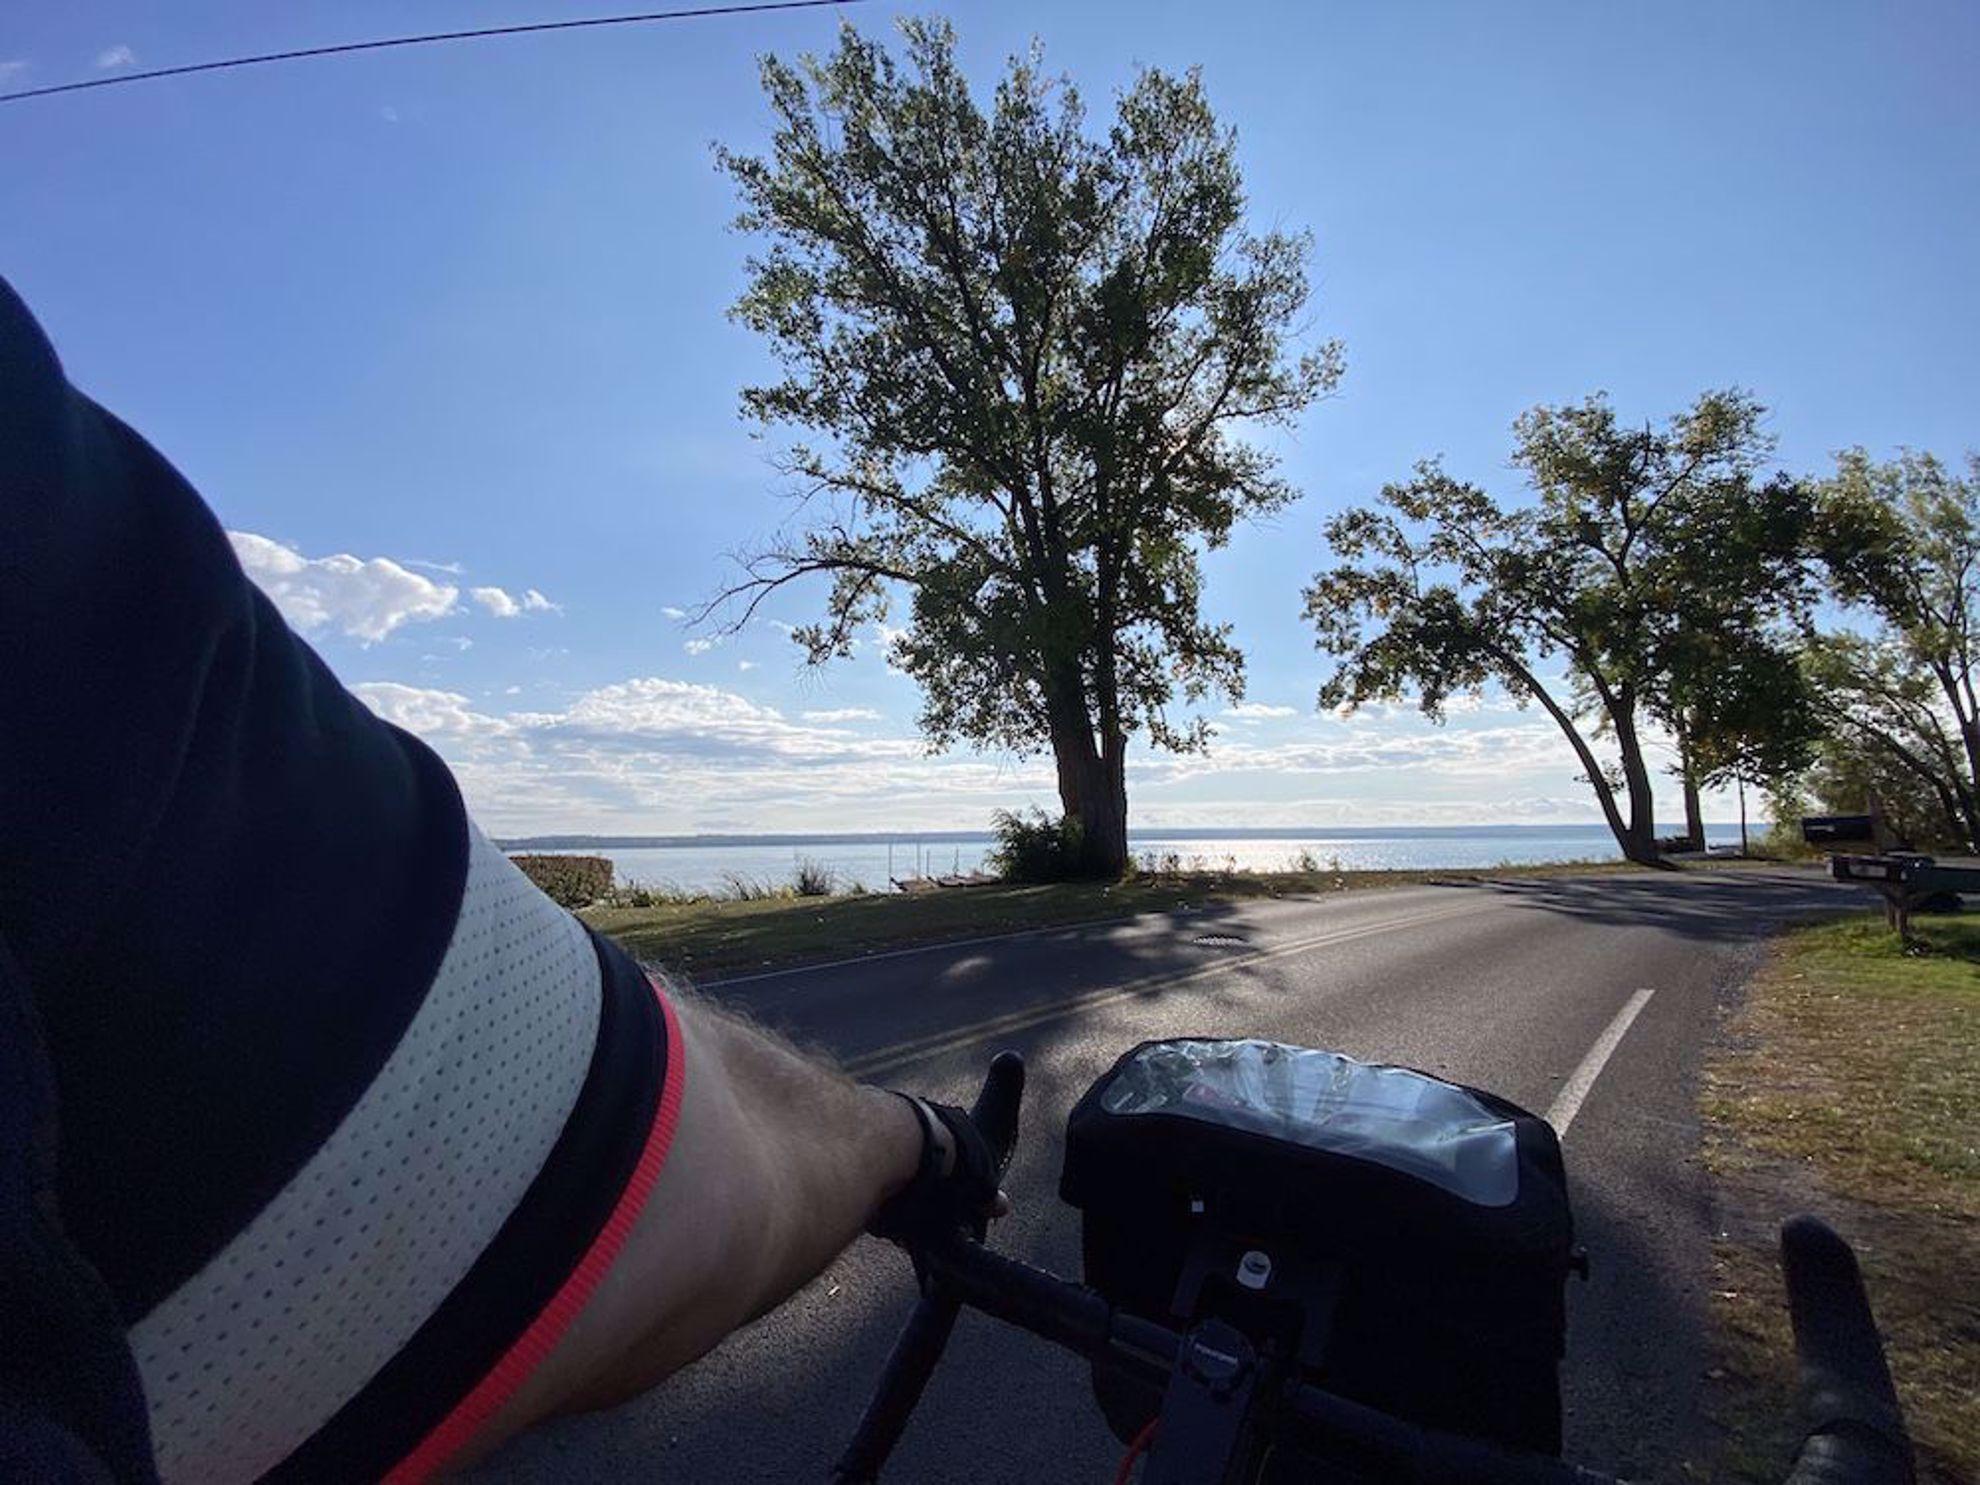 Biking by the college